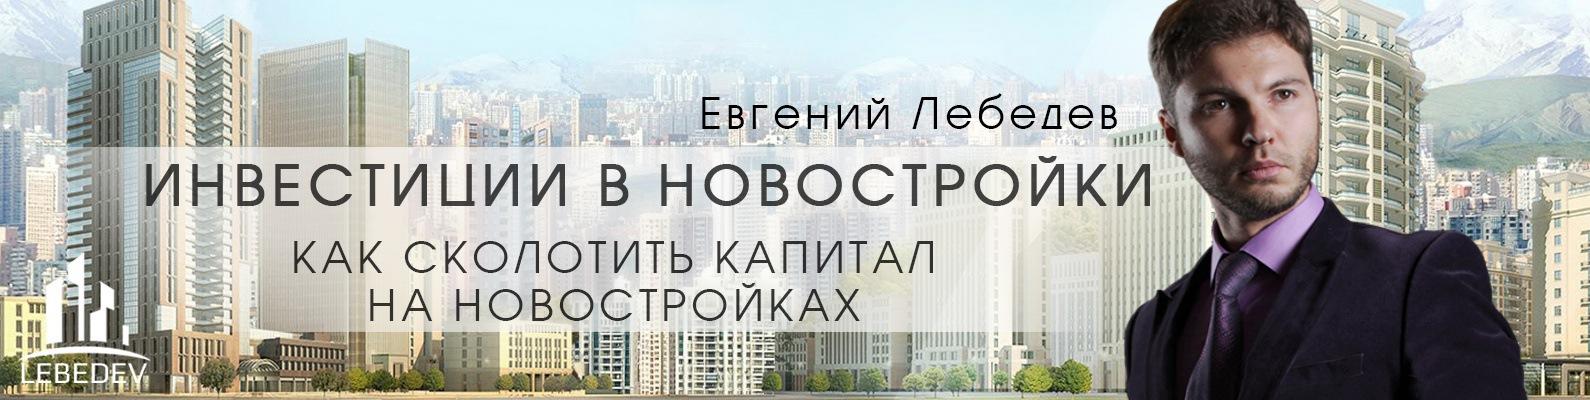 5 курсов по инвестированию Инвестиции в новостройки Е.Лебедева